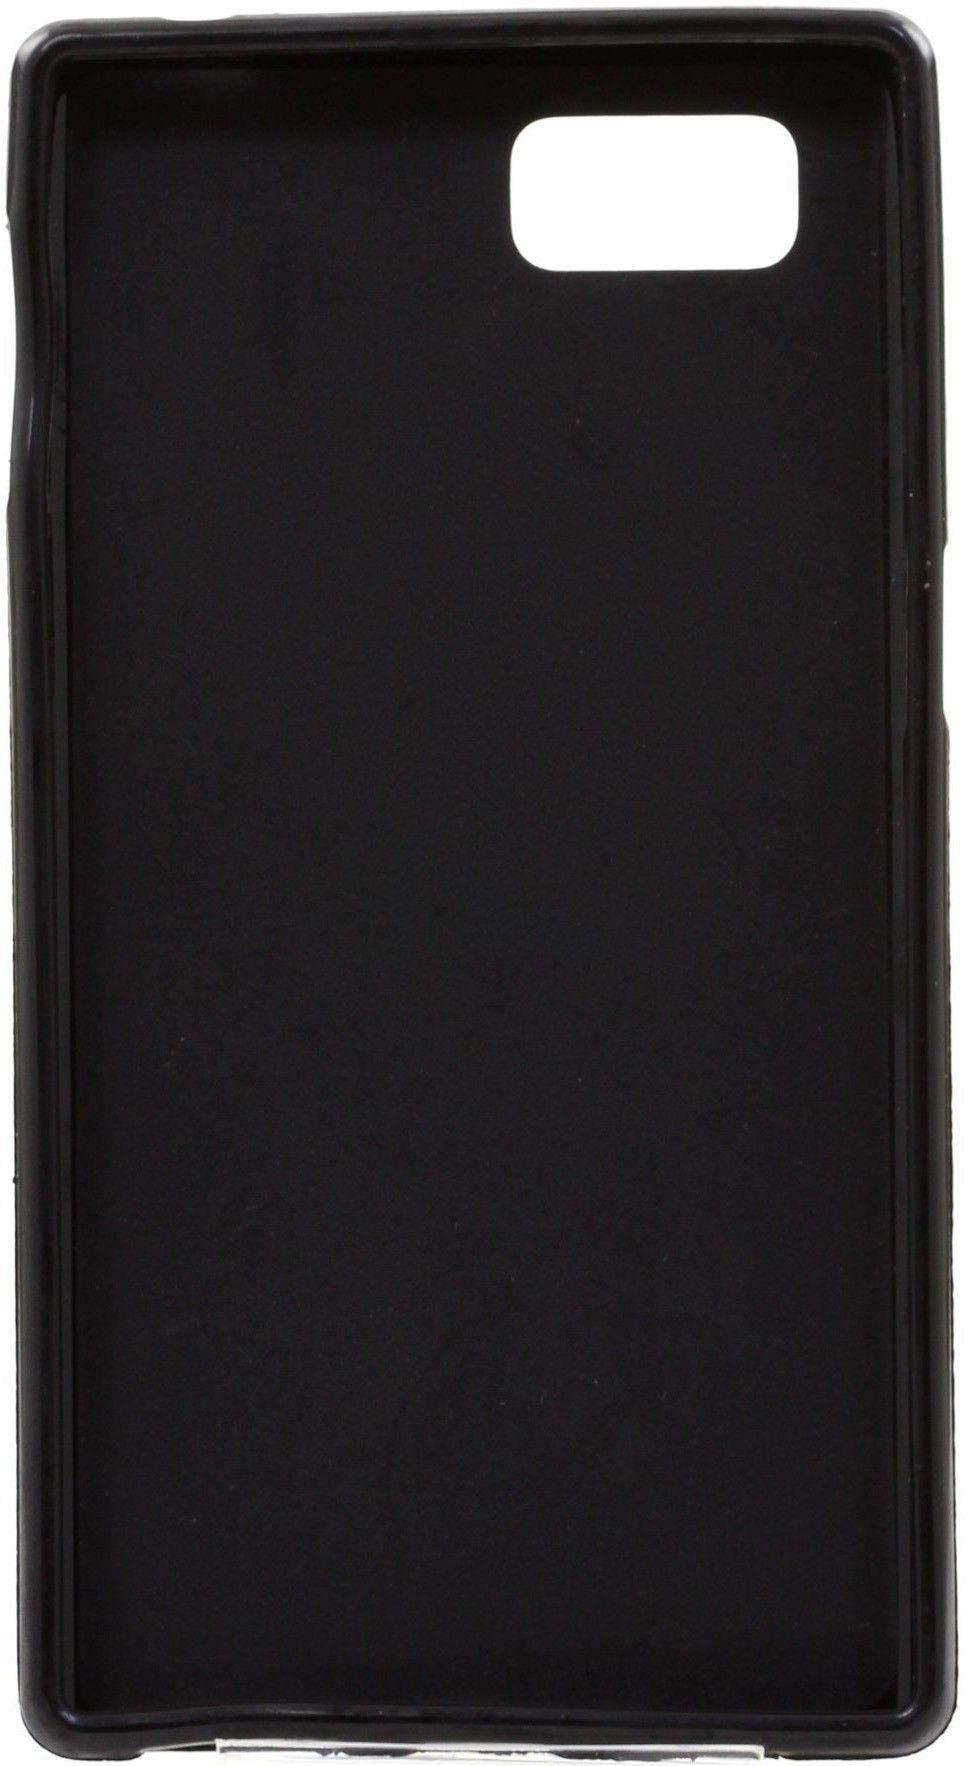 Чехол-накладка Drobak Elastic PU для Lenovo A6000/6010 Black - Фото 1